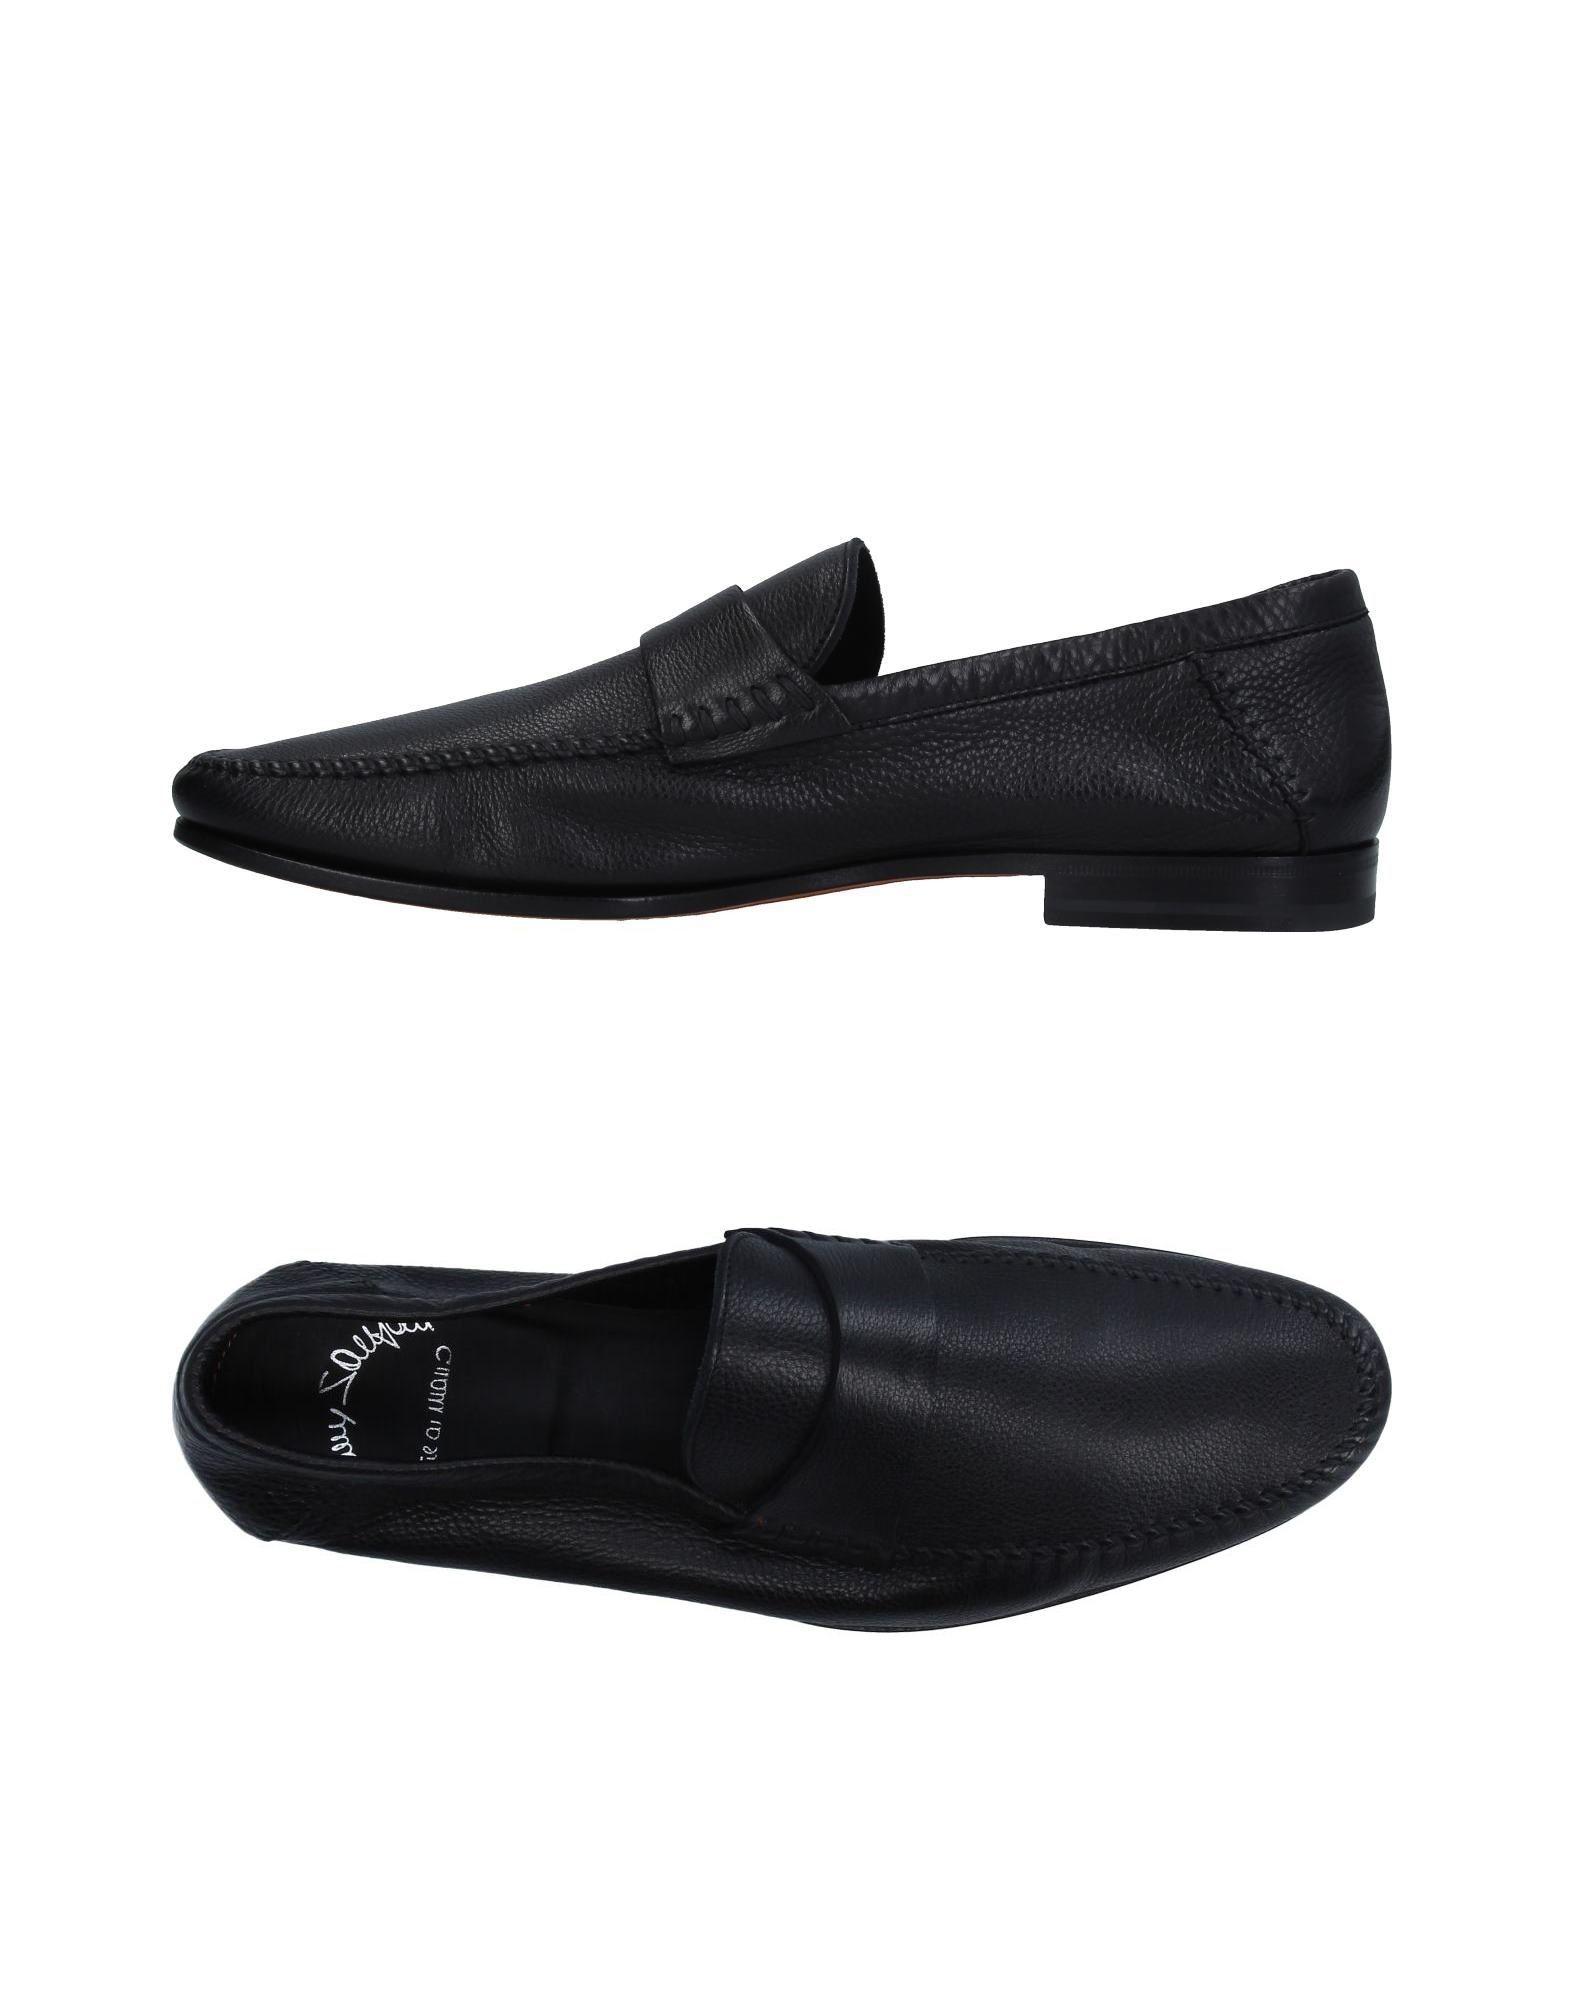 Santoni Mokassins Herren  11330067TN Gute Qualität beliebte Schuhe